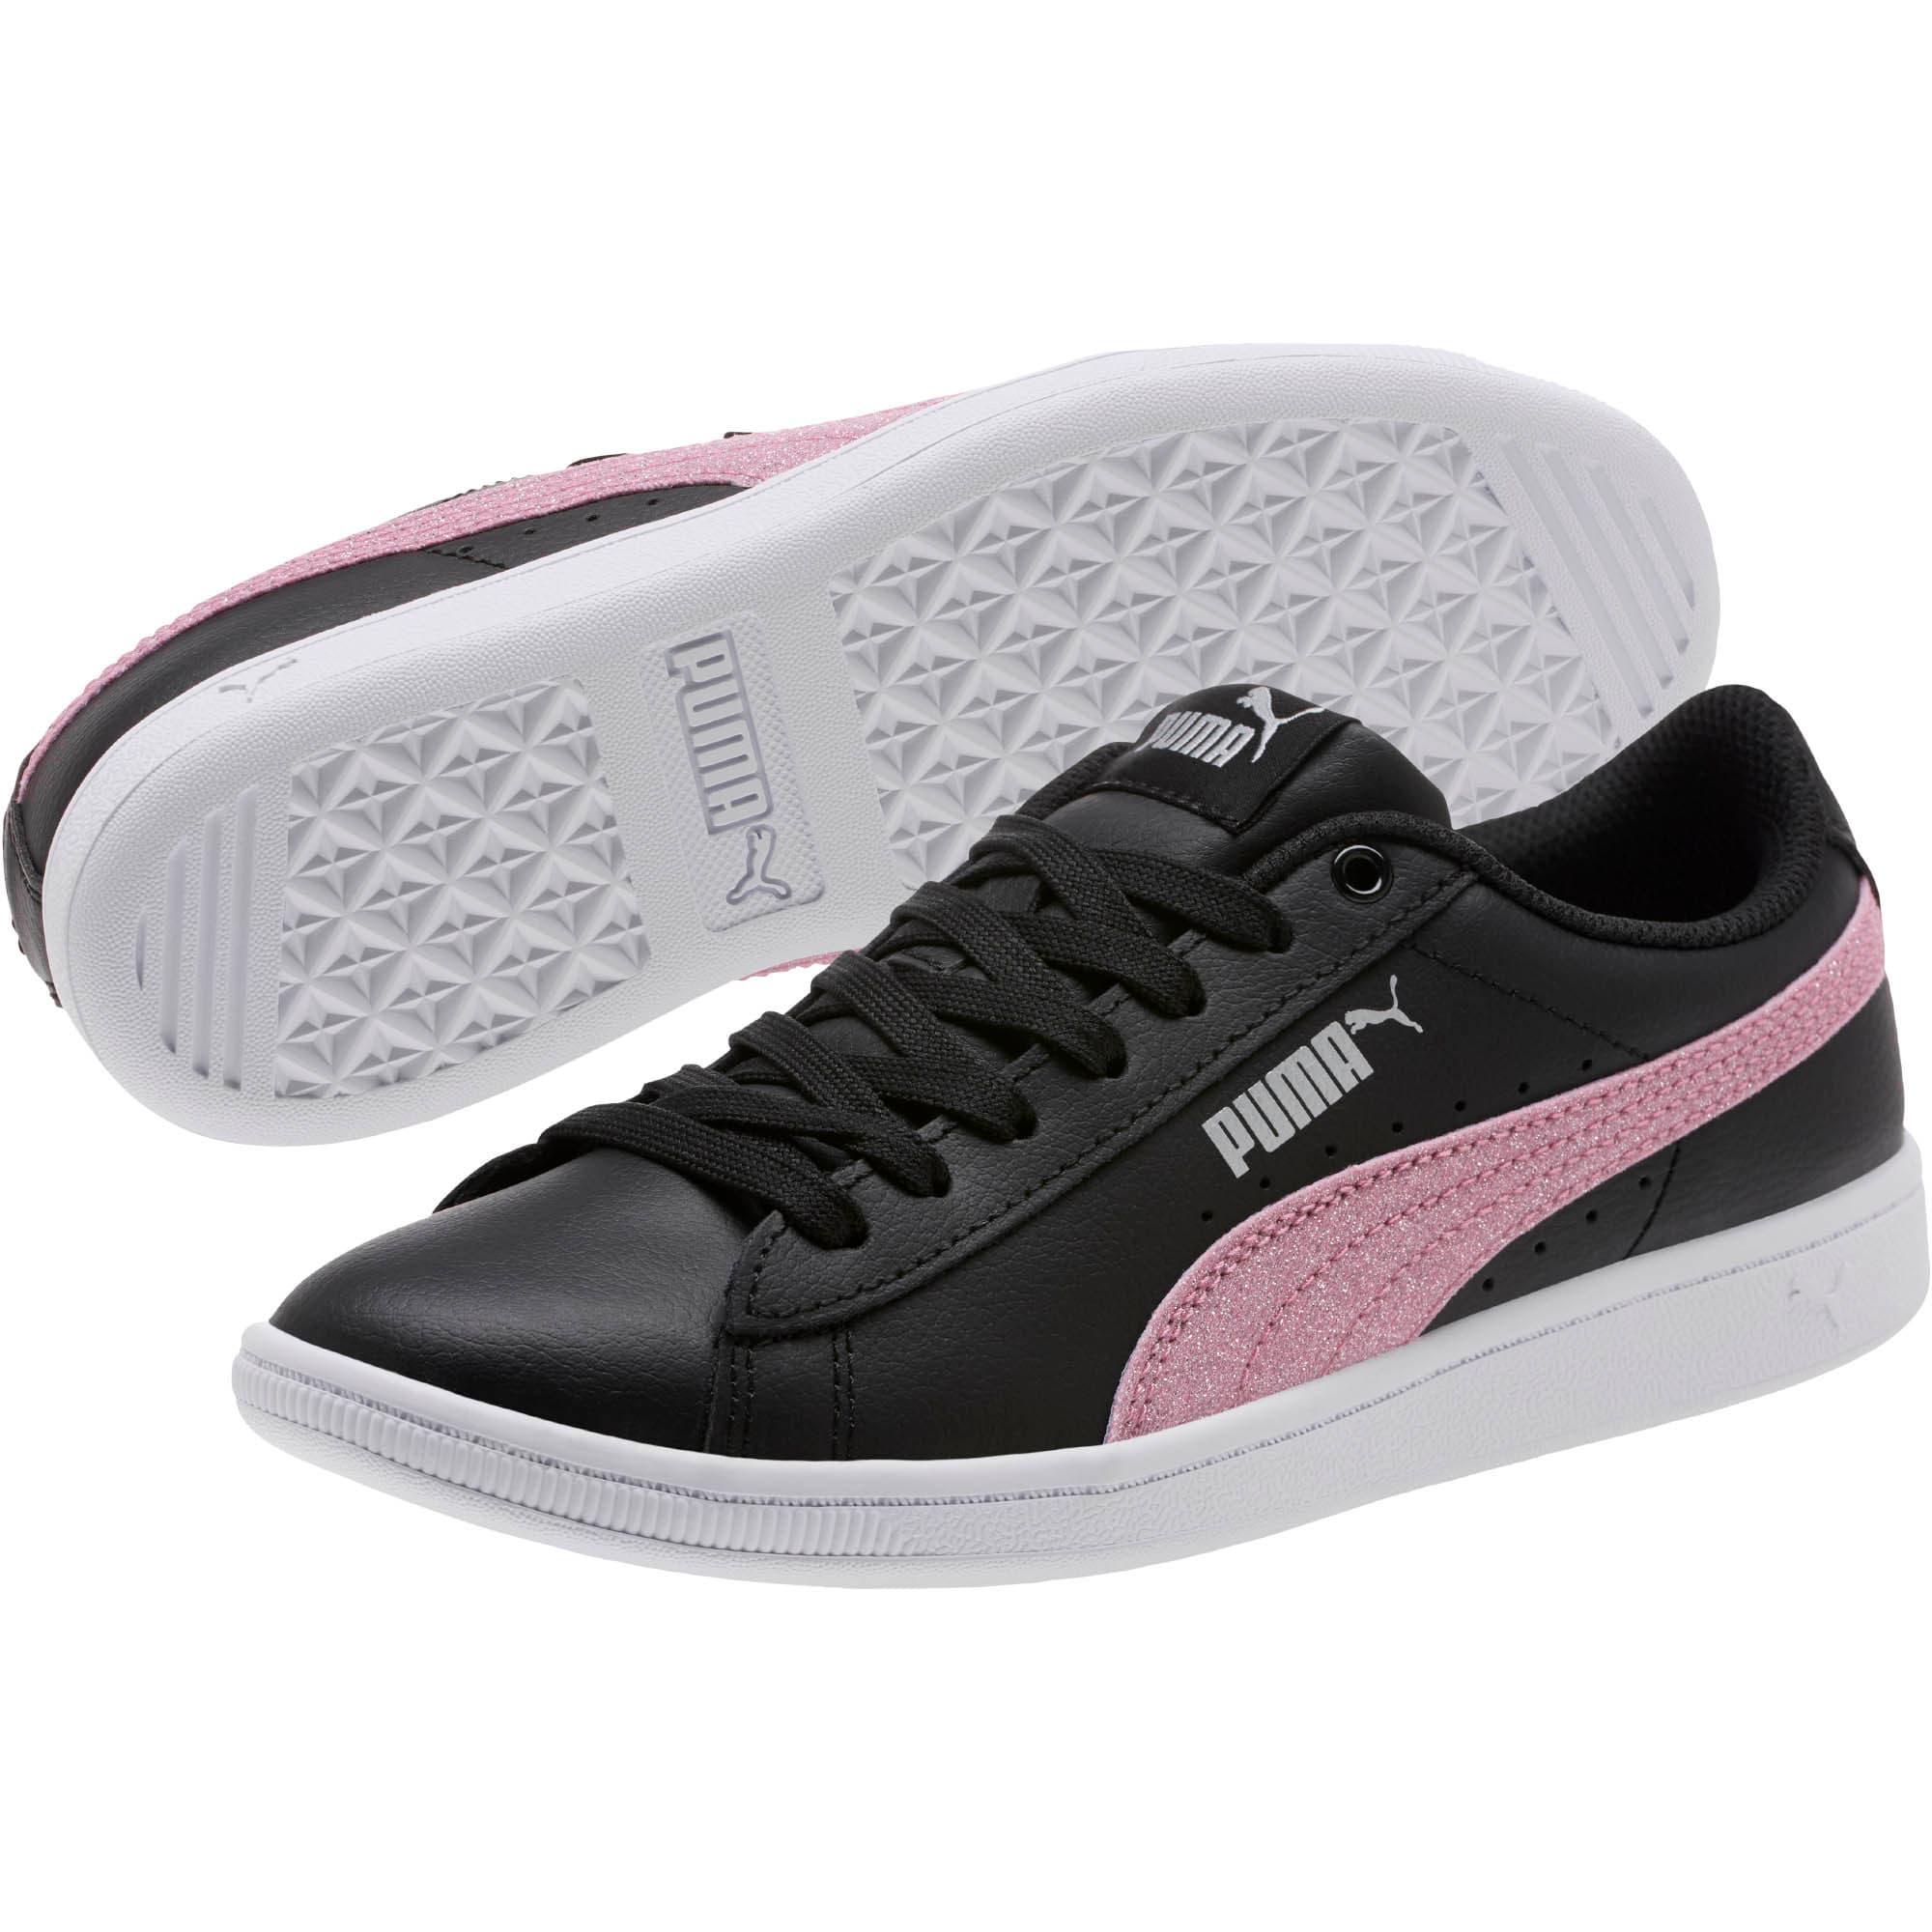 Thumbnail 2 of Puma Vikky Glitz FS Sneakers JR, Black-Orchid-Silver, medium